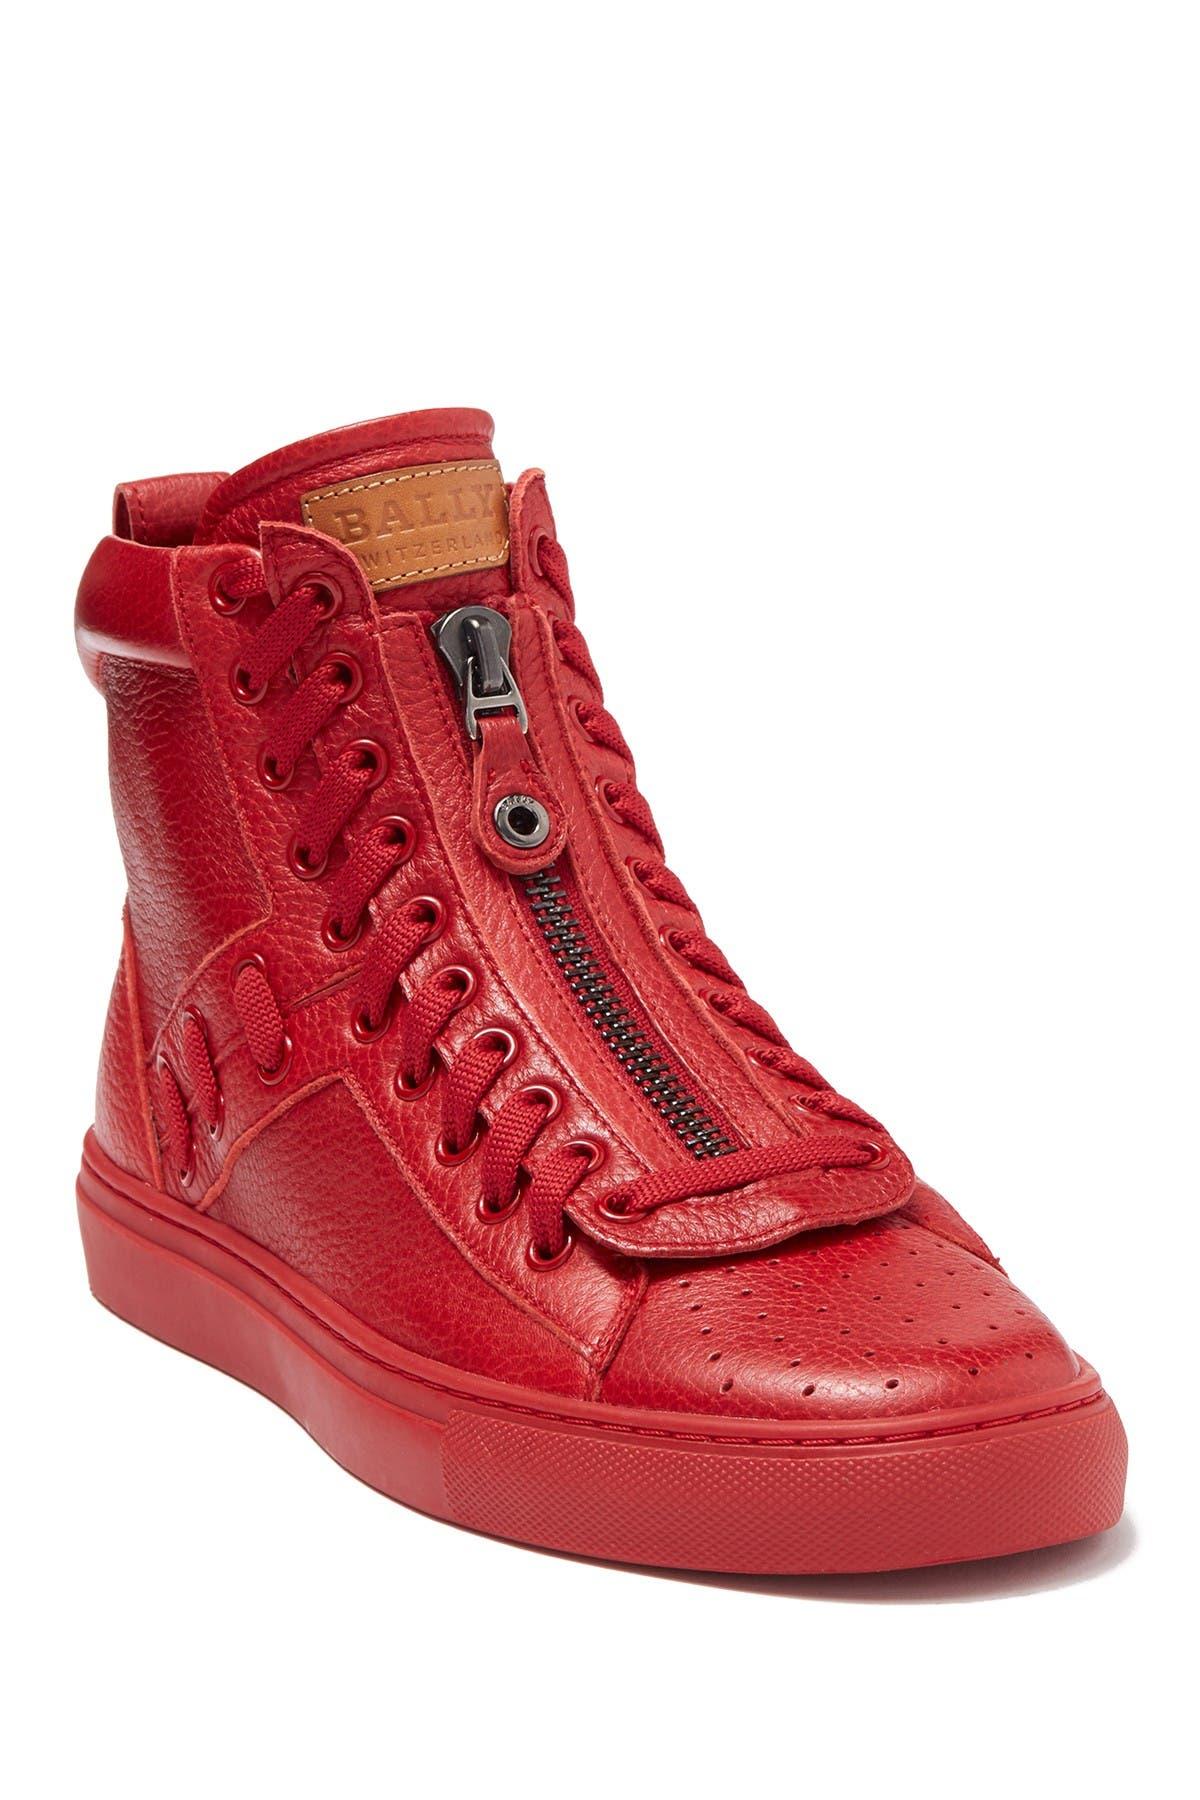 BALLY | Hekem Leather Sneaker